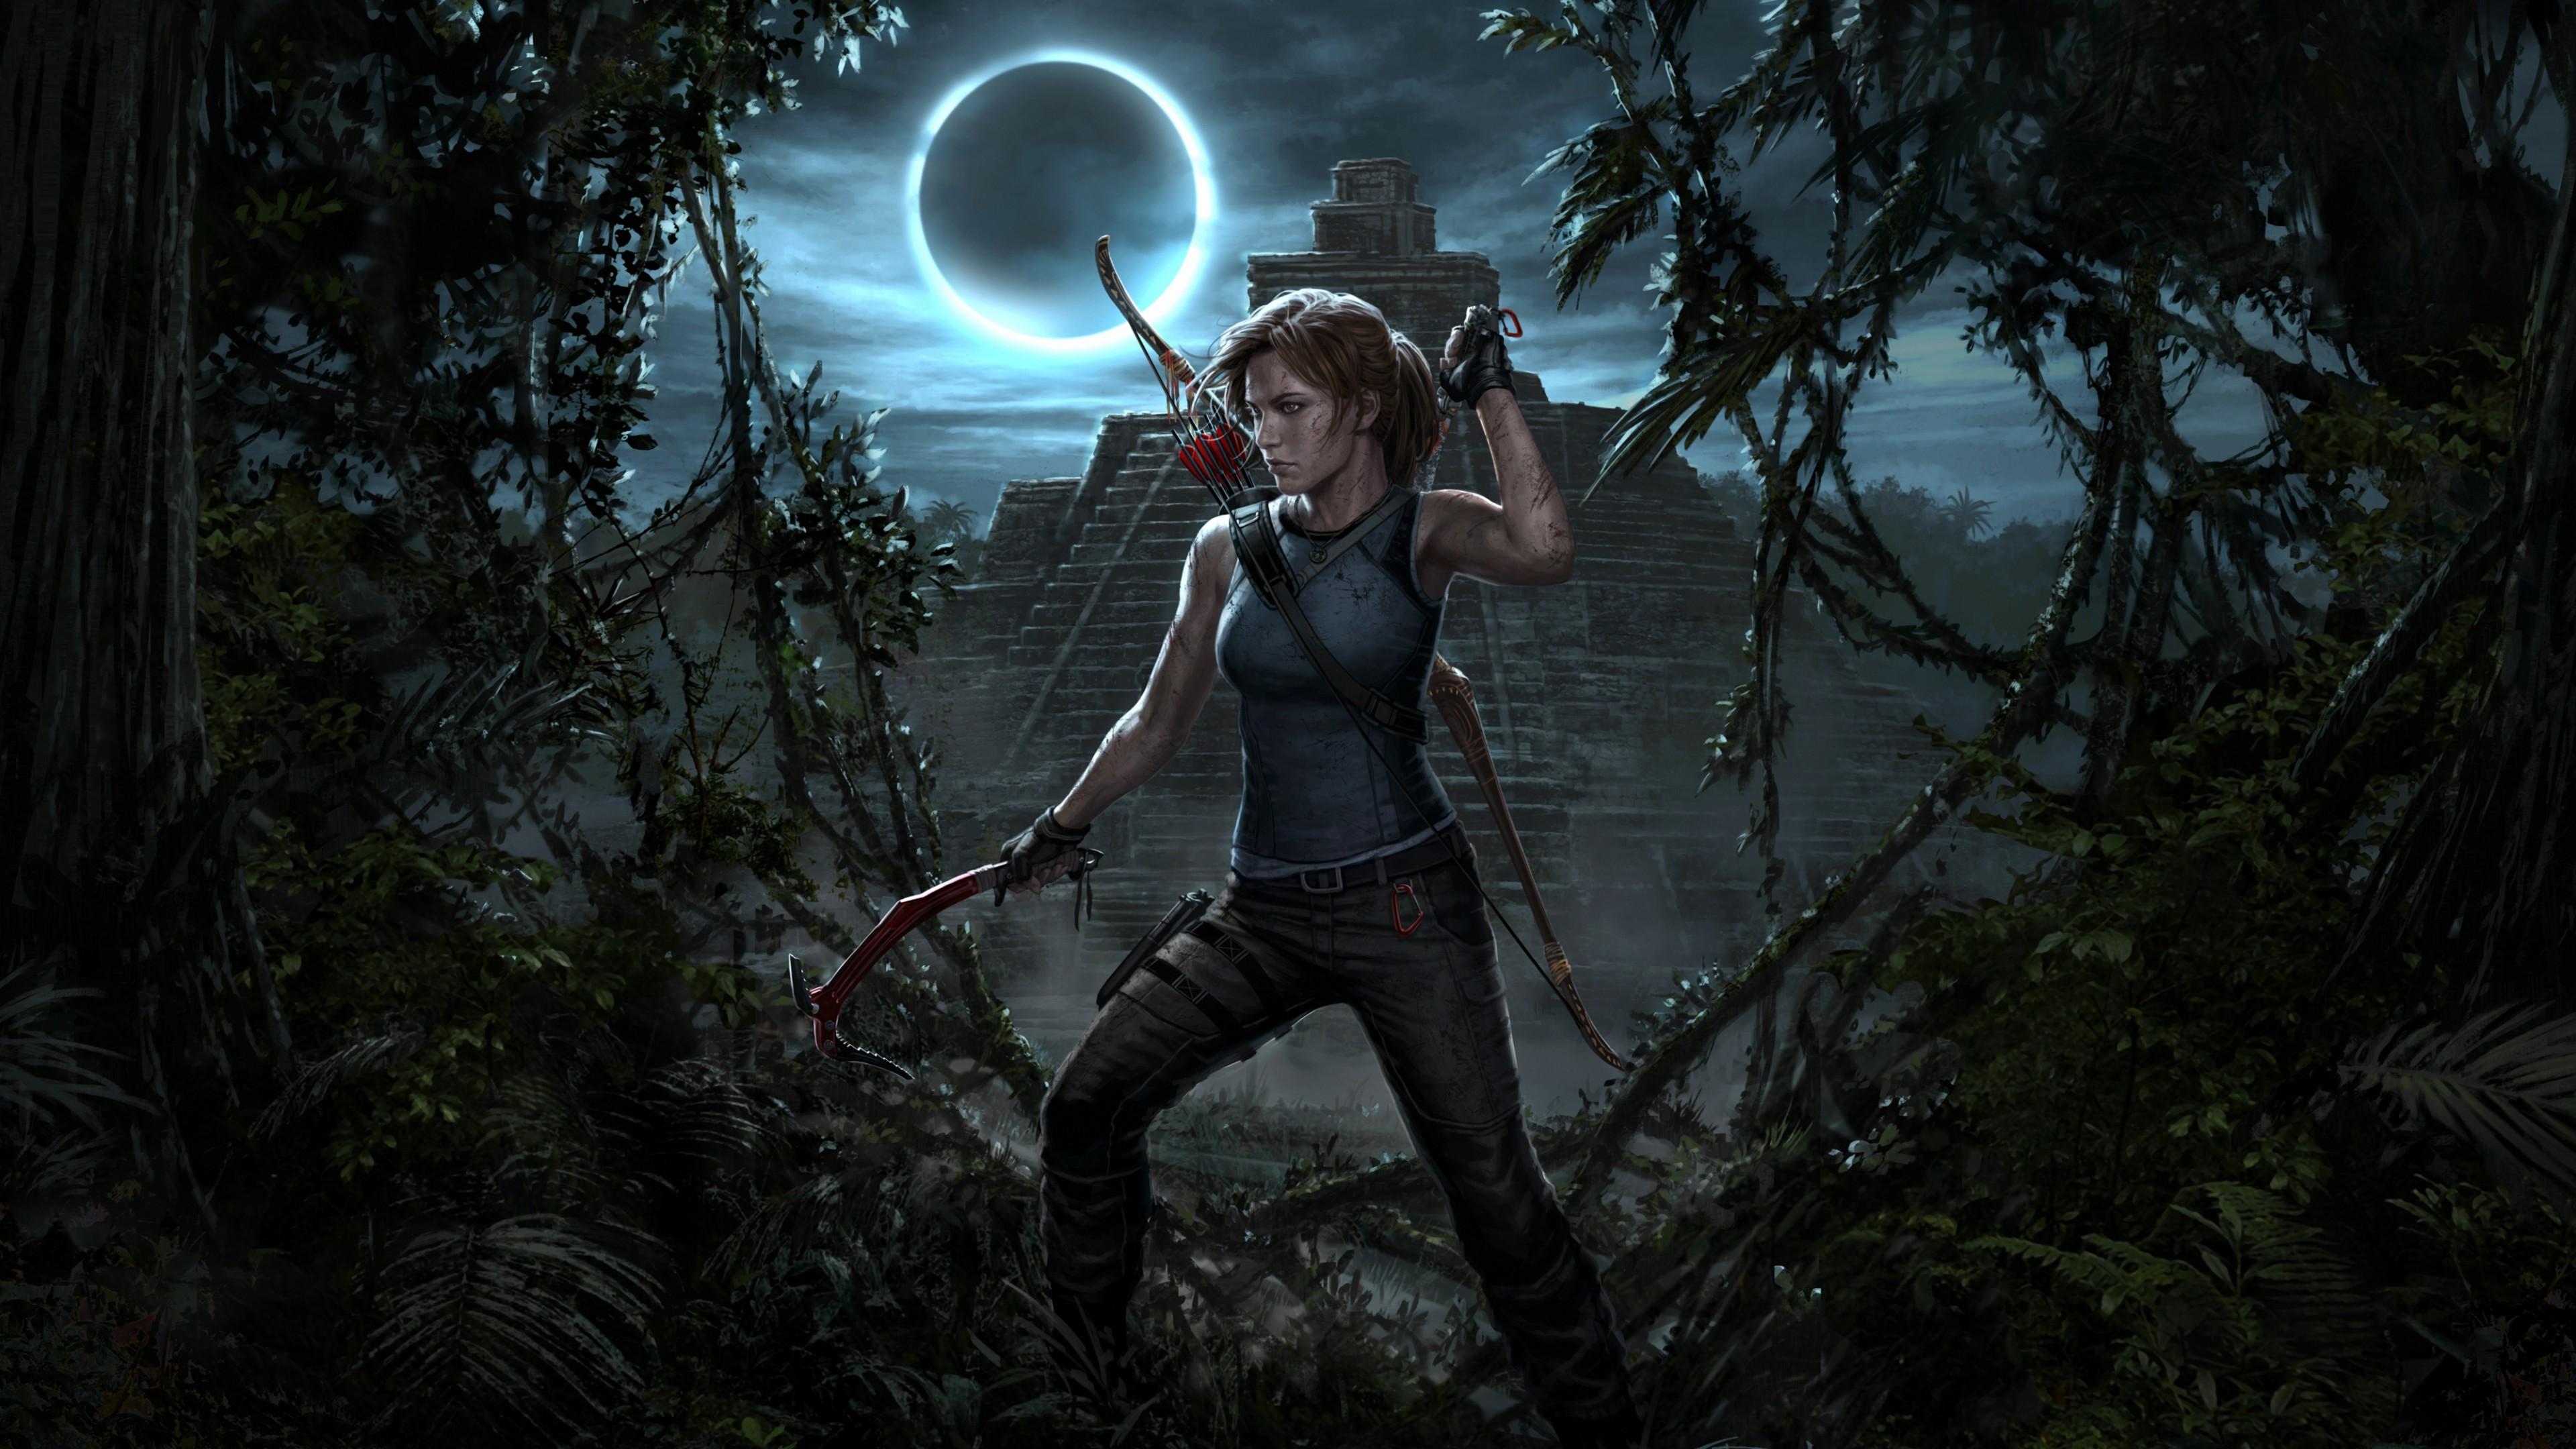 Tomb Raider Iphone X Wallpaper Shadow Of The Tomb Raider Lara Croft Wallpapers Hd